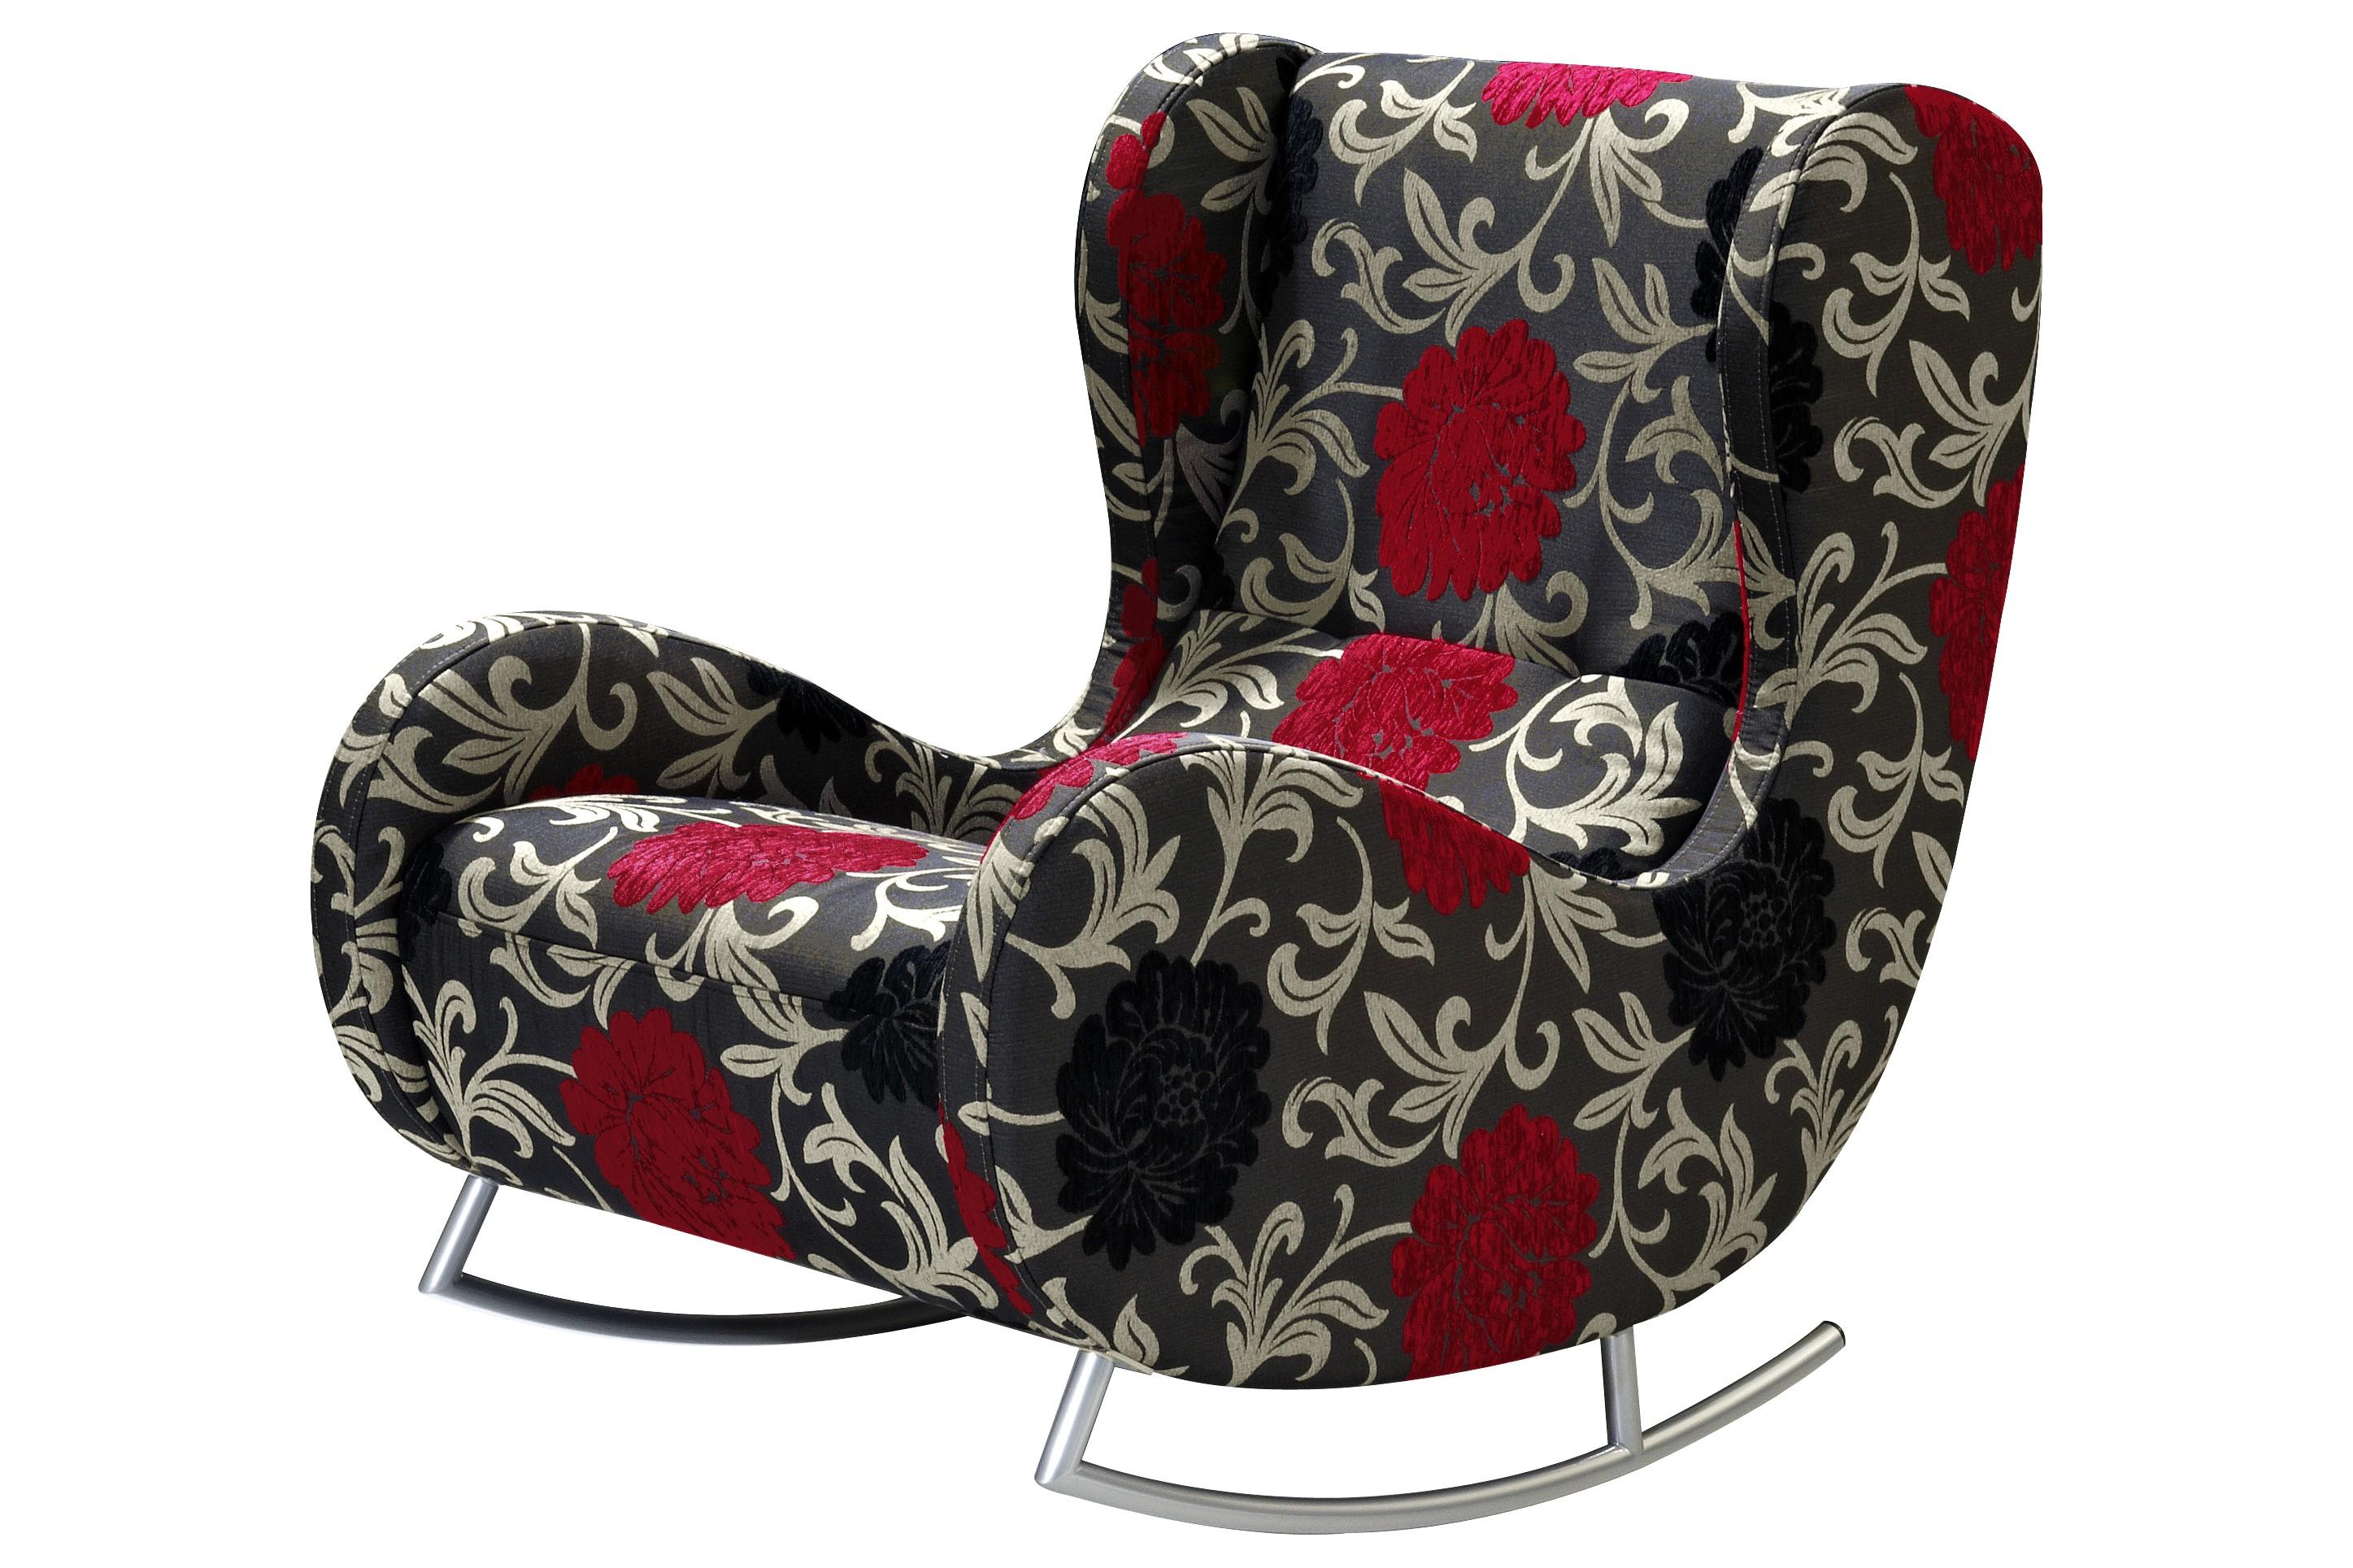 der farben thread seite 92 allmystery. Black Bedroom Furniture Sets. Home Design Ideas